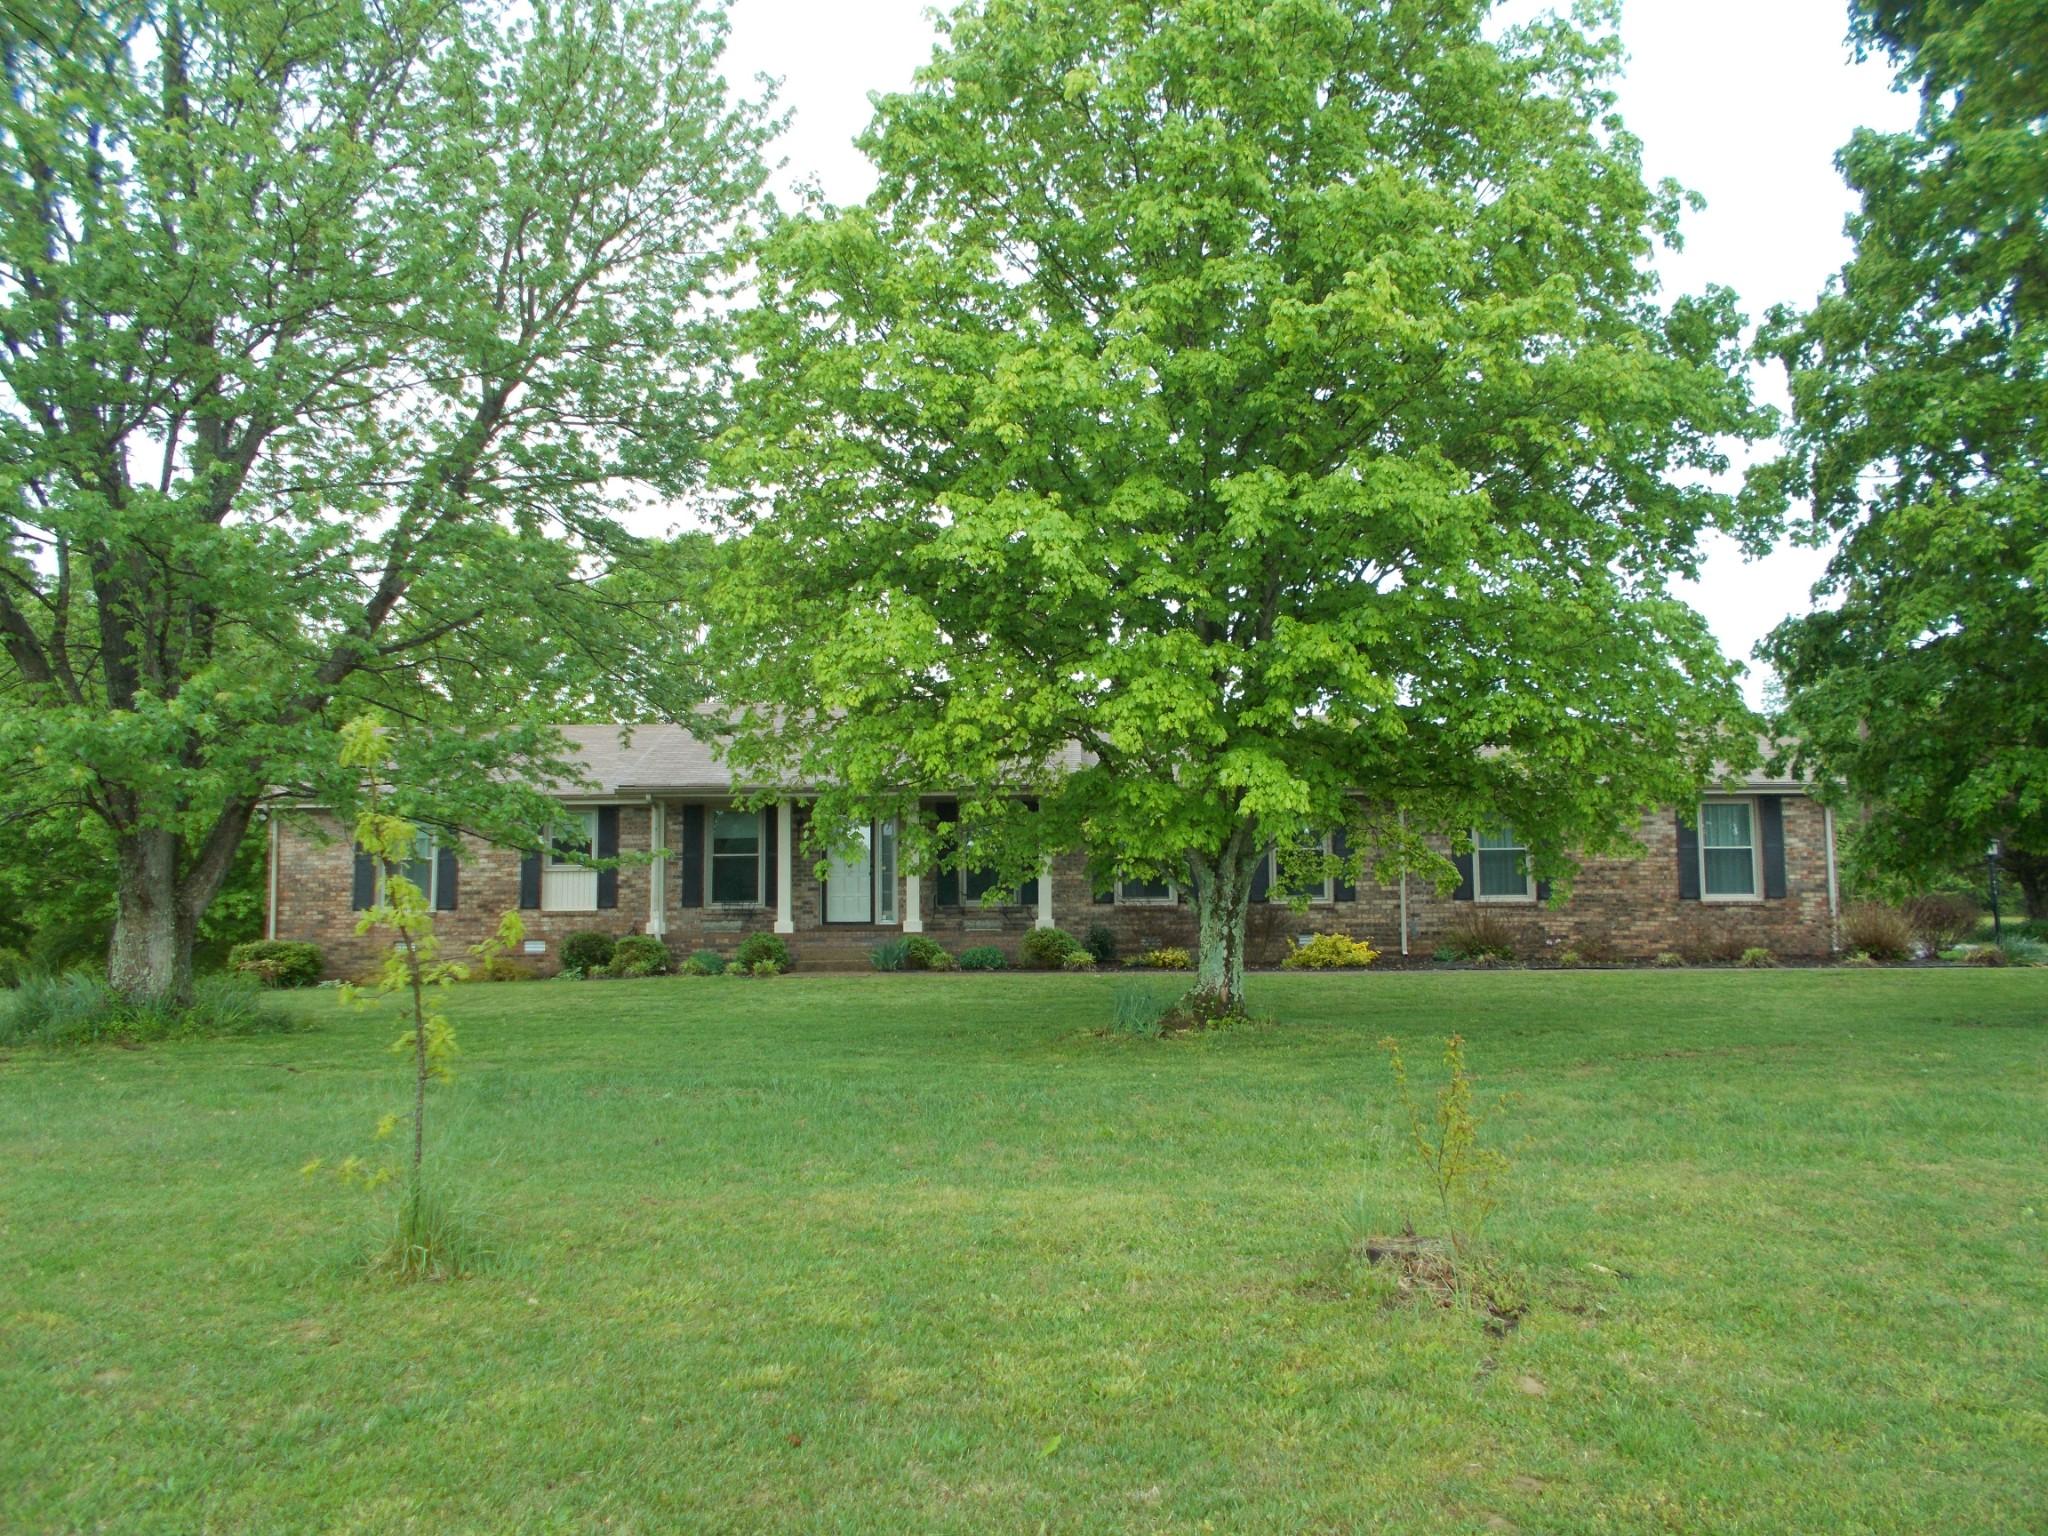 7832 Greenbrier Rd, Joelton, TN 37080 - Joelton, TN real estate listing